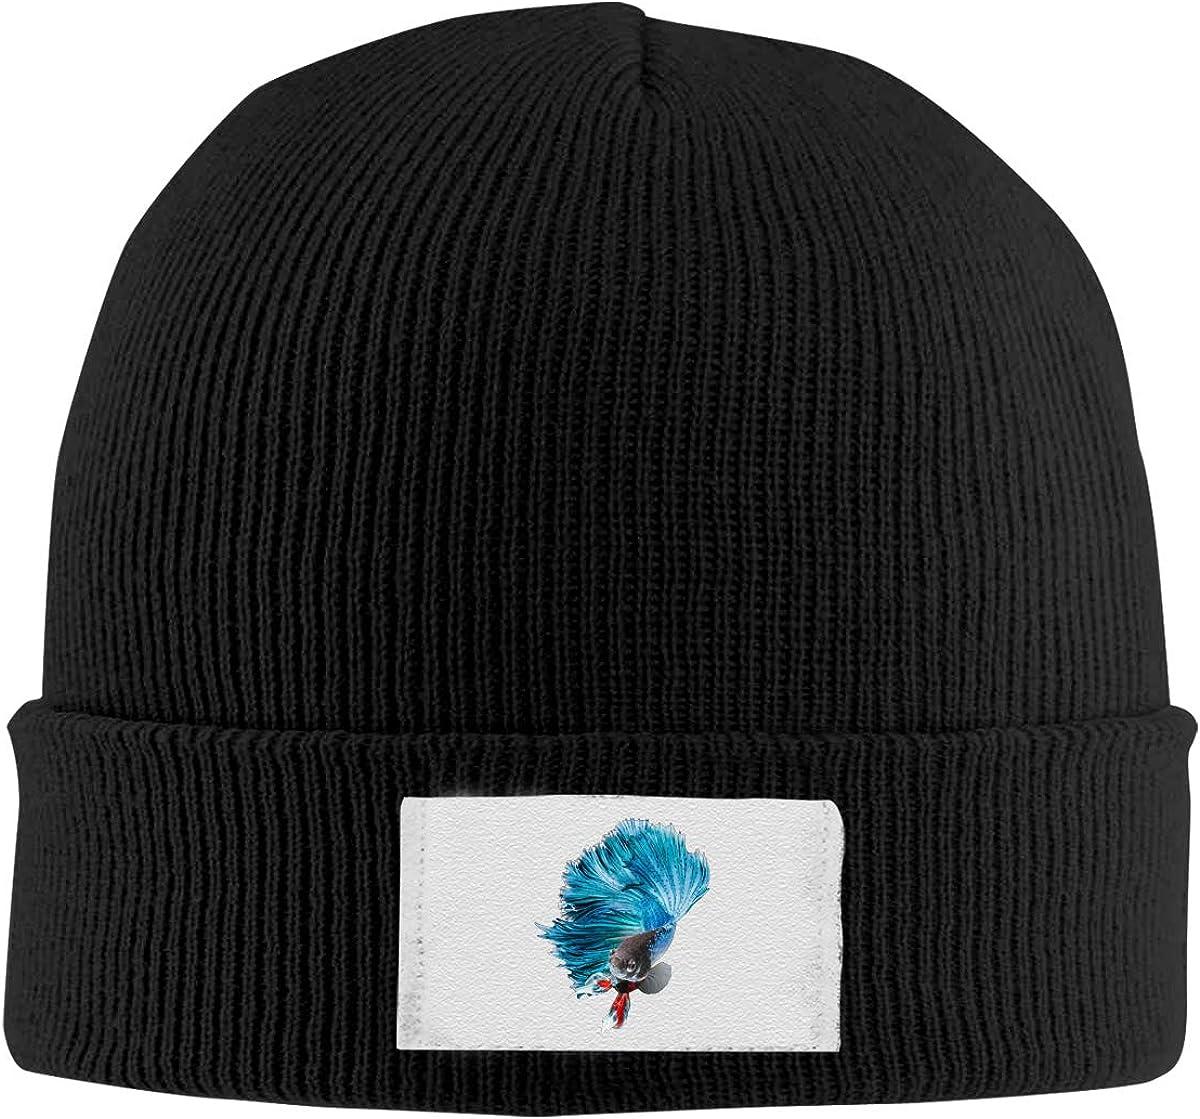 Dunpaiaa Skull Caps Goldfish with Cap Winter Warm Knit Hats Stretchy Cuff Beanie Hat Black